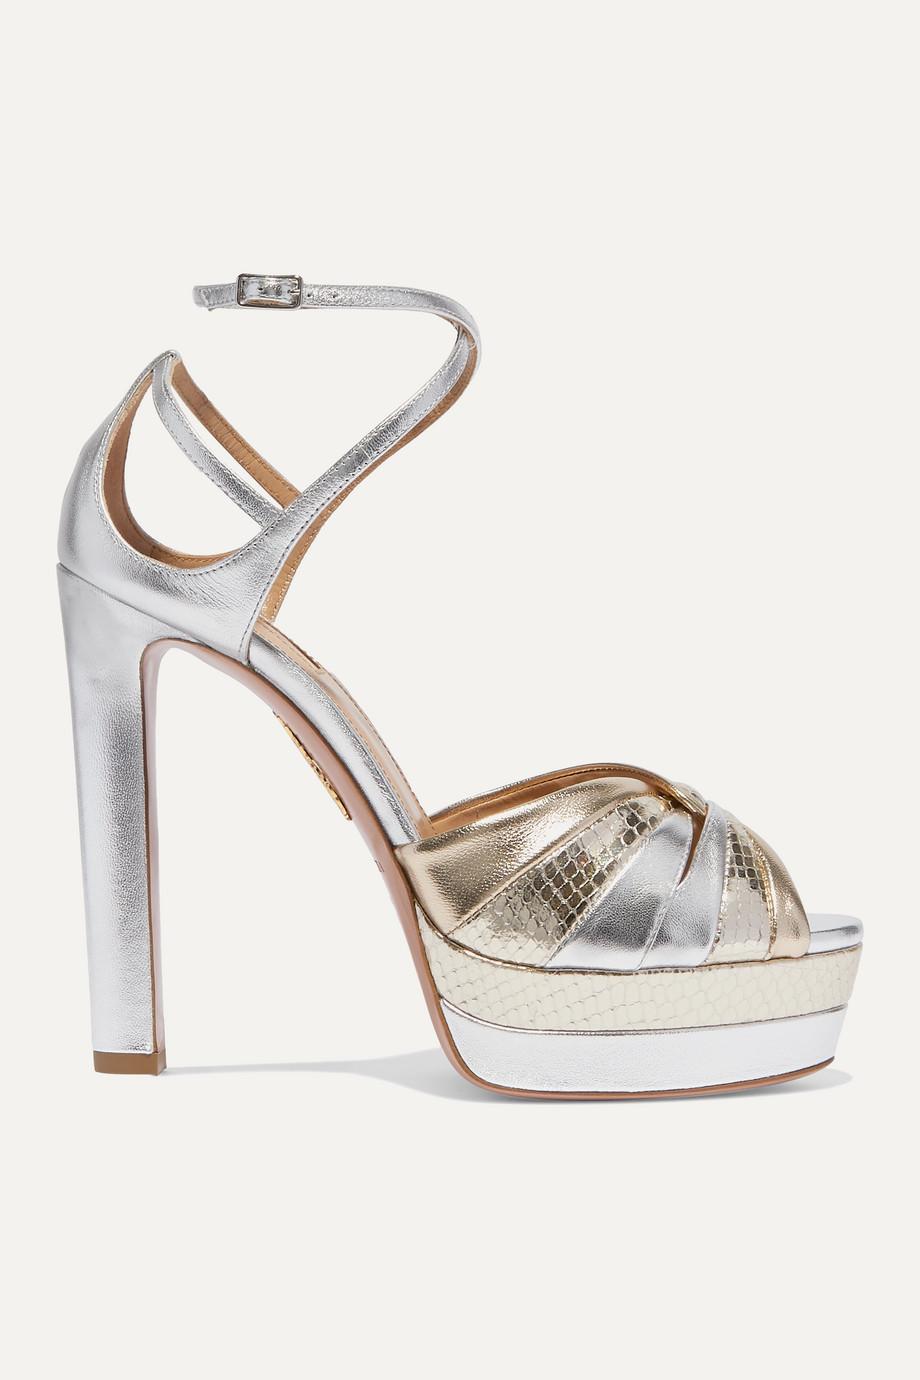 Aquazzura La Di Da 130 two-tone metallic leather platform sandals